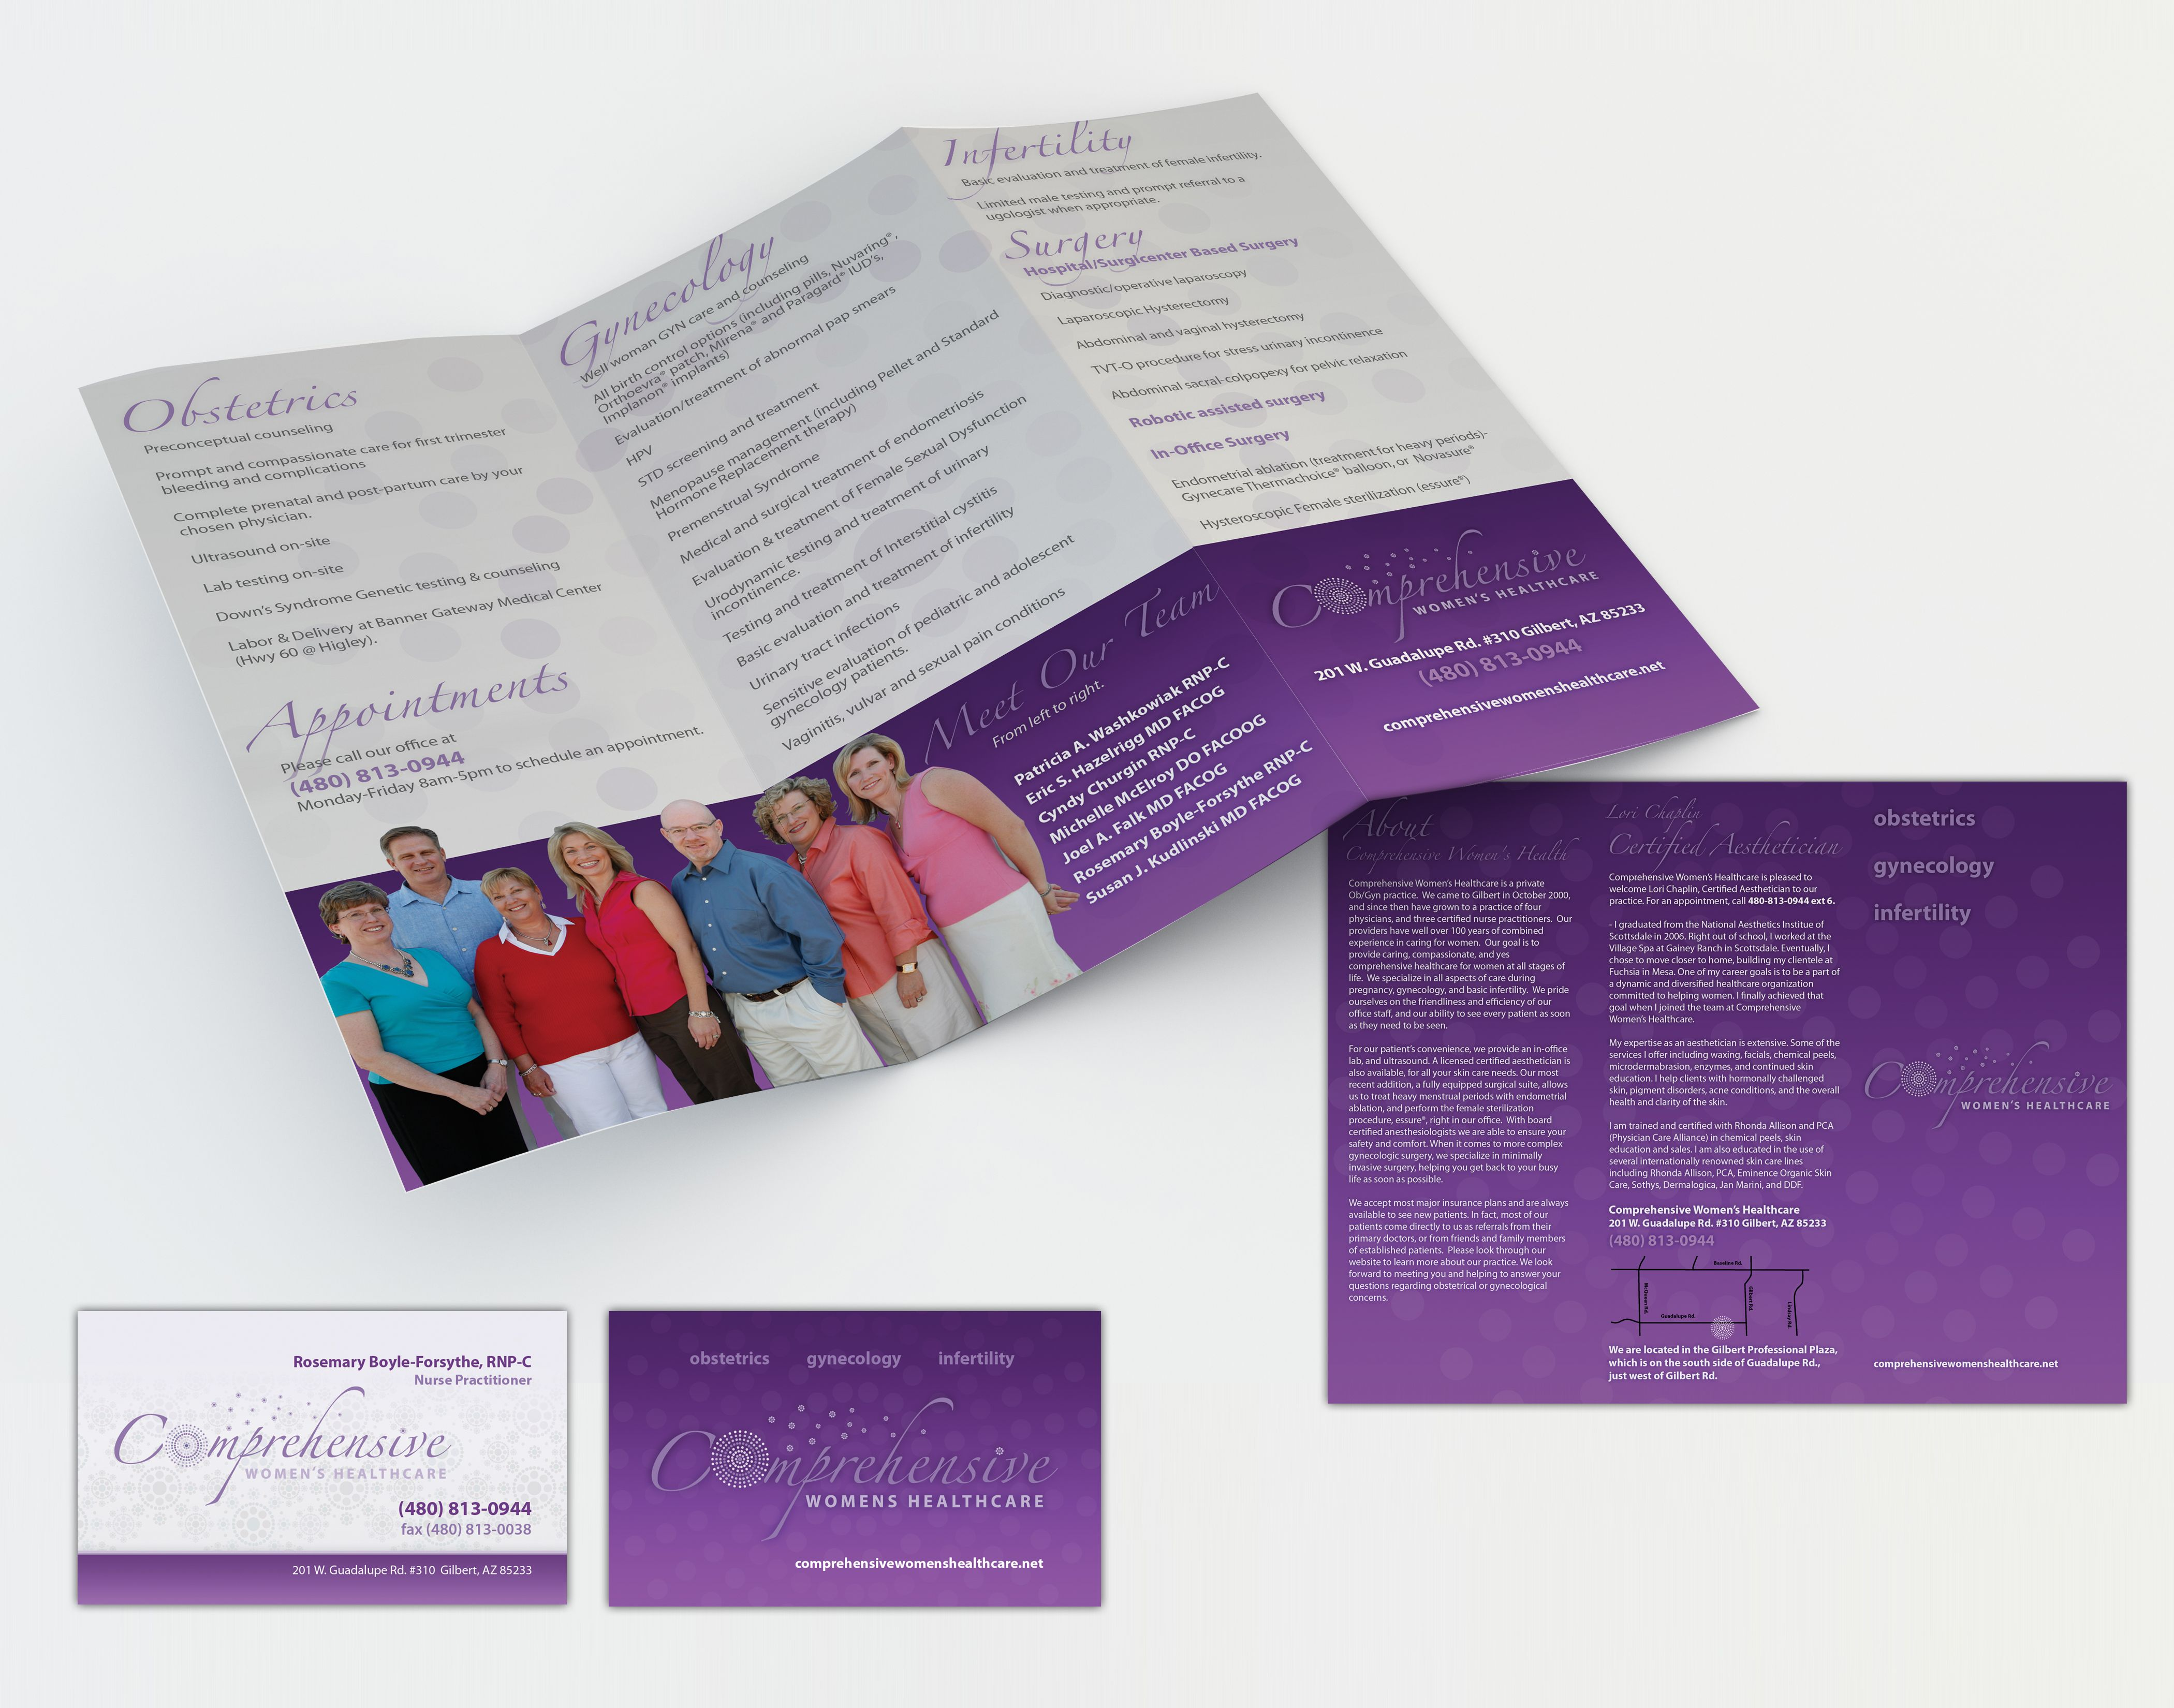 Comprehensive womens healthcare mobile app design